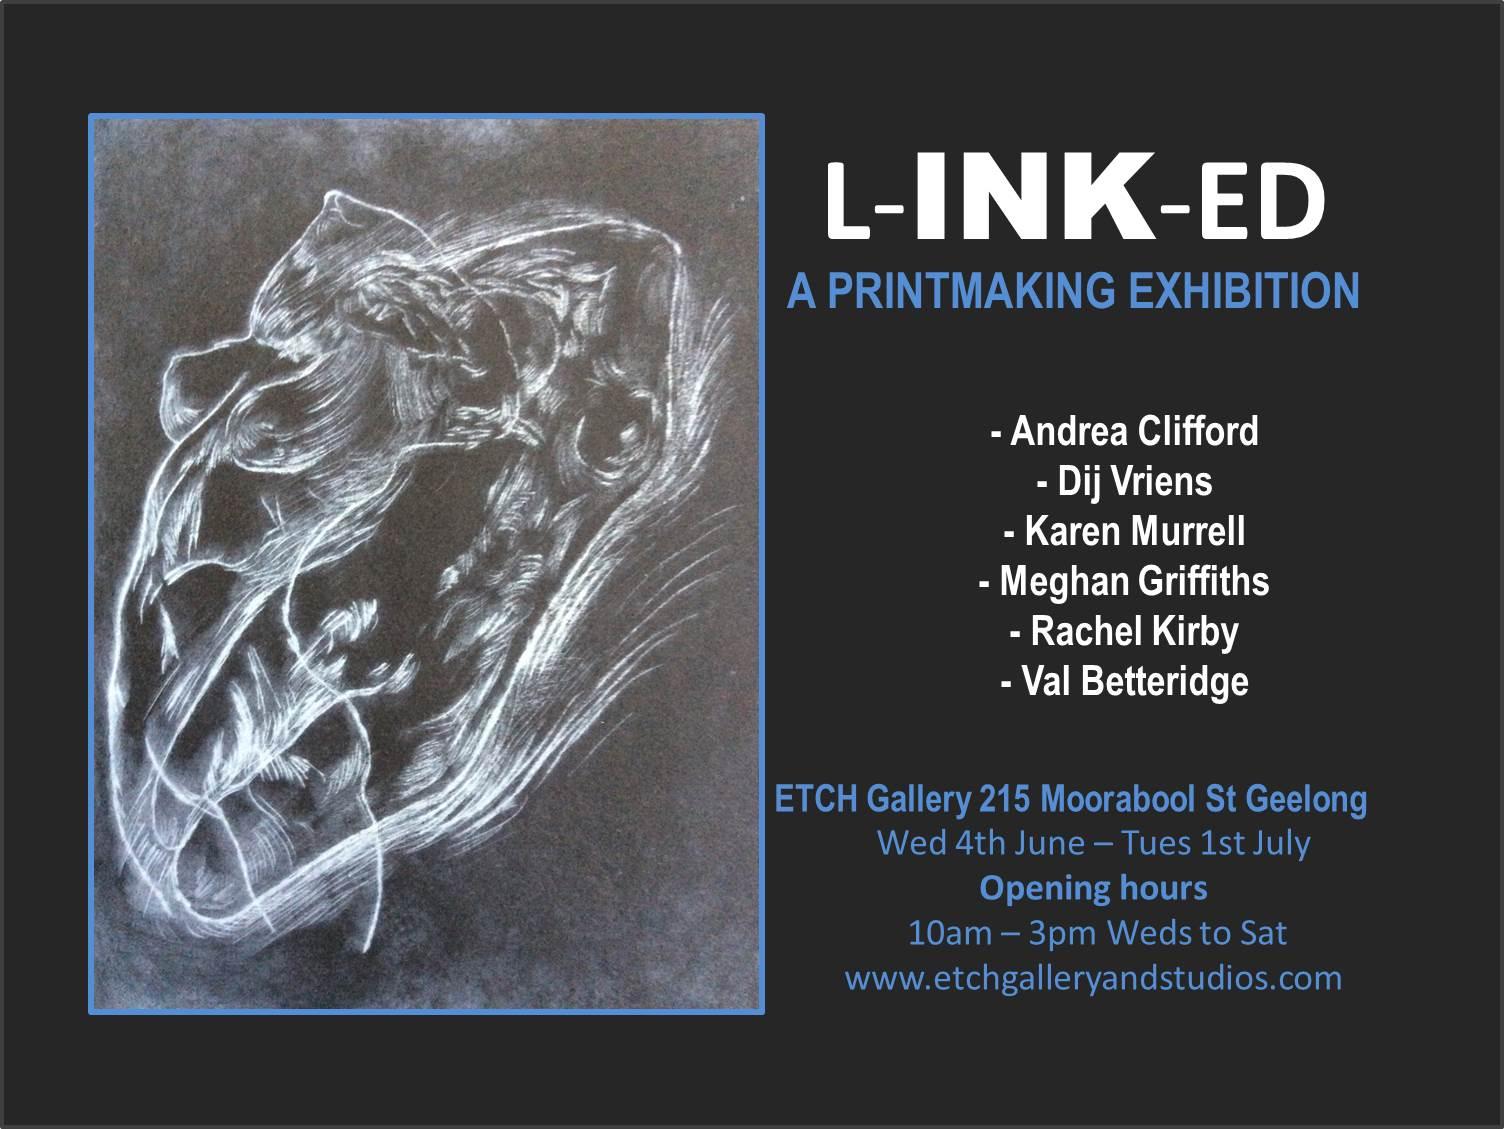 L-INK-ED Invite